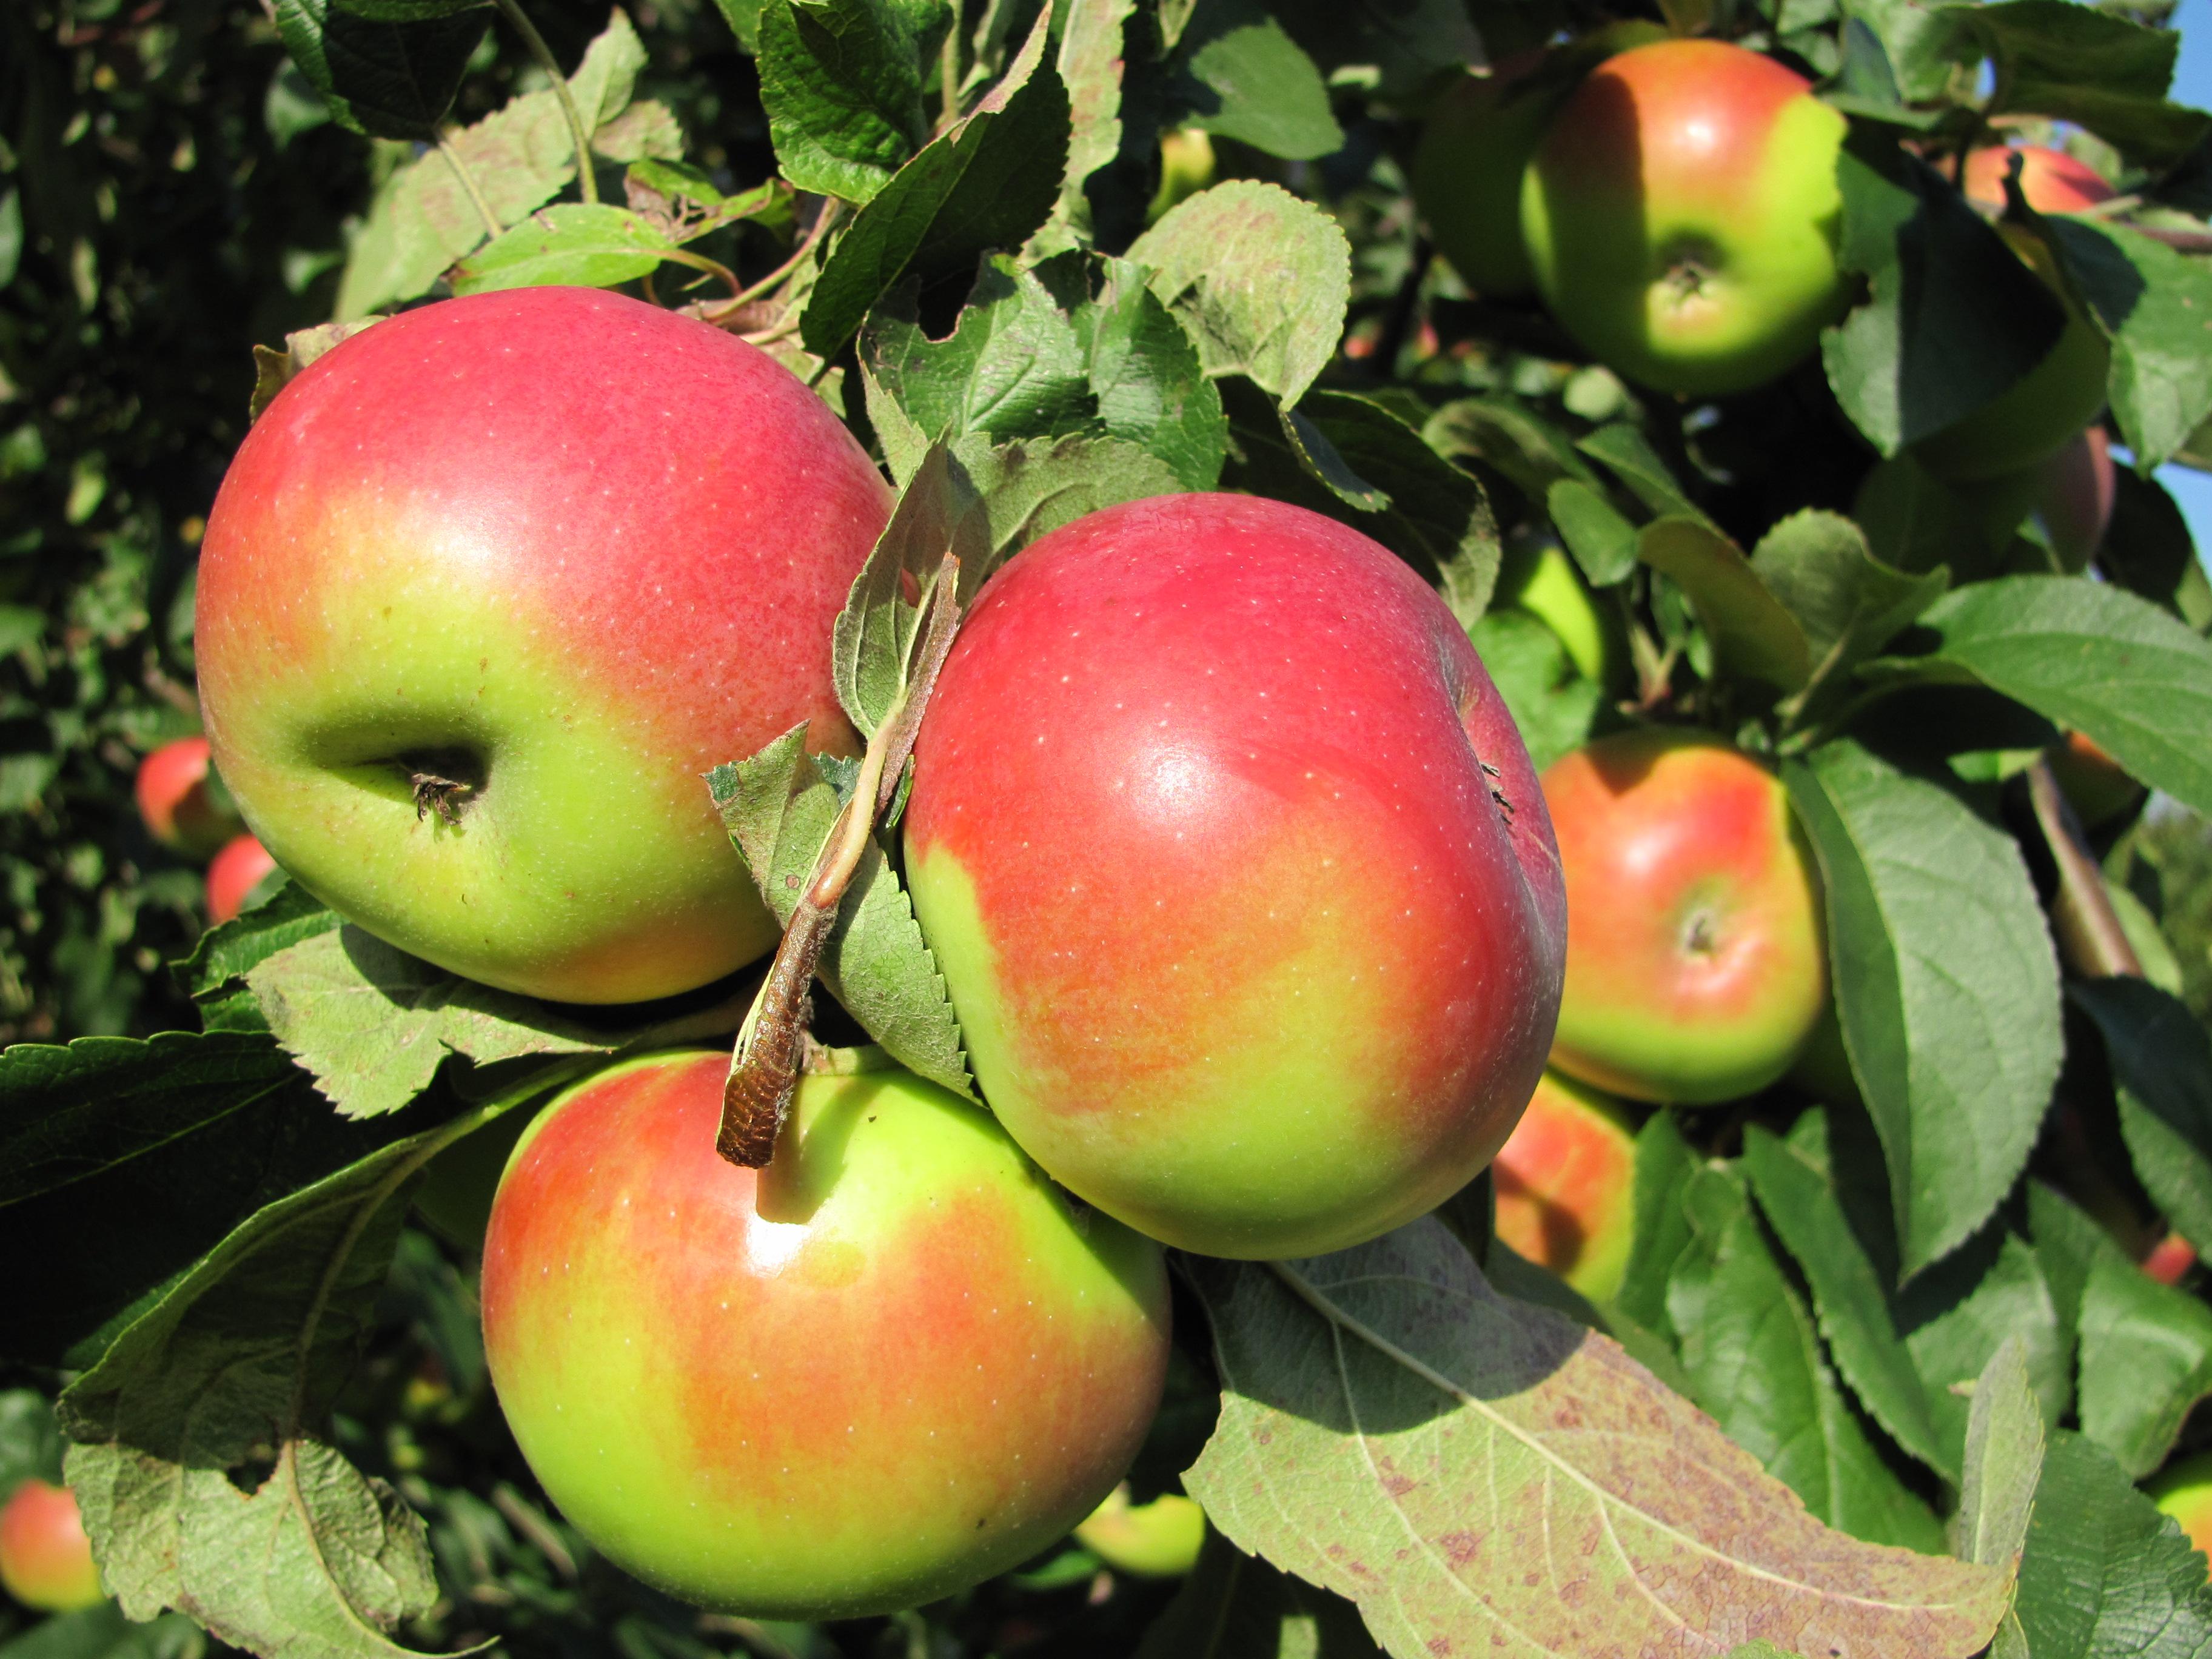 Apfelbaumfoto